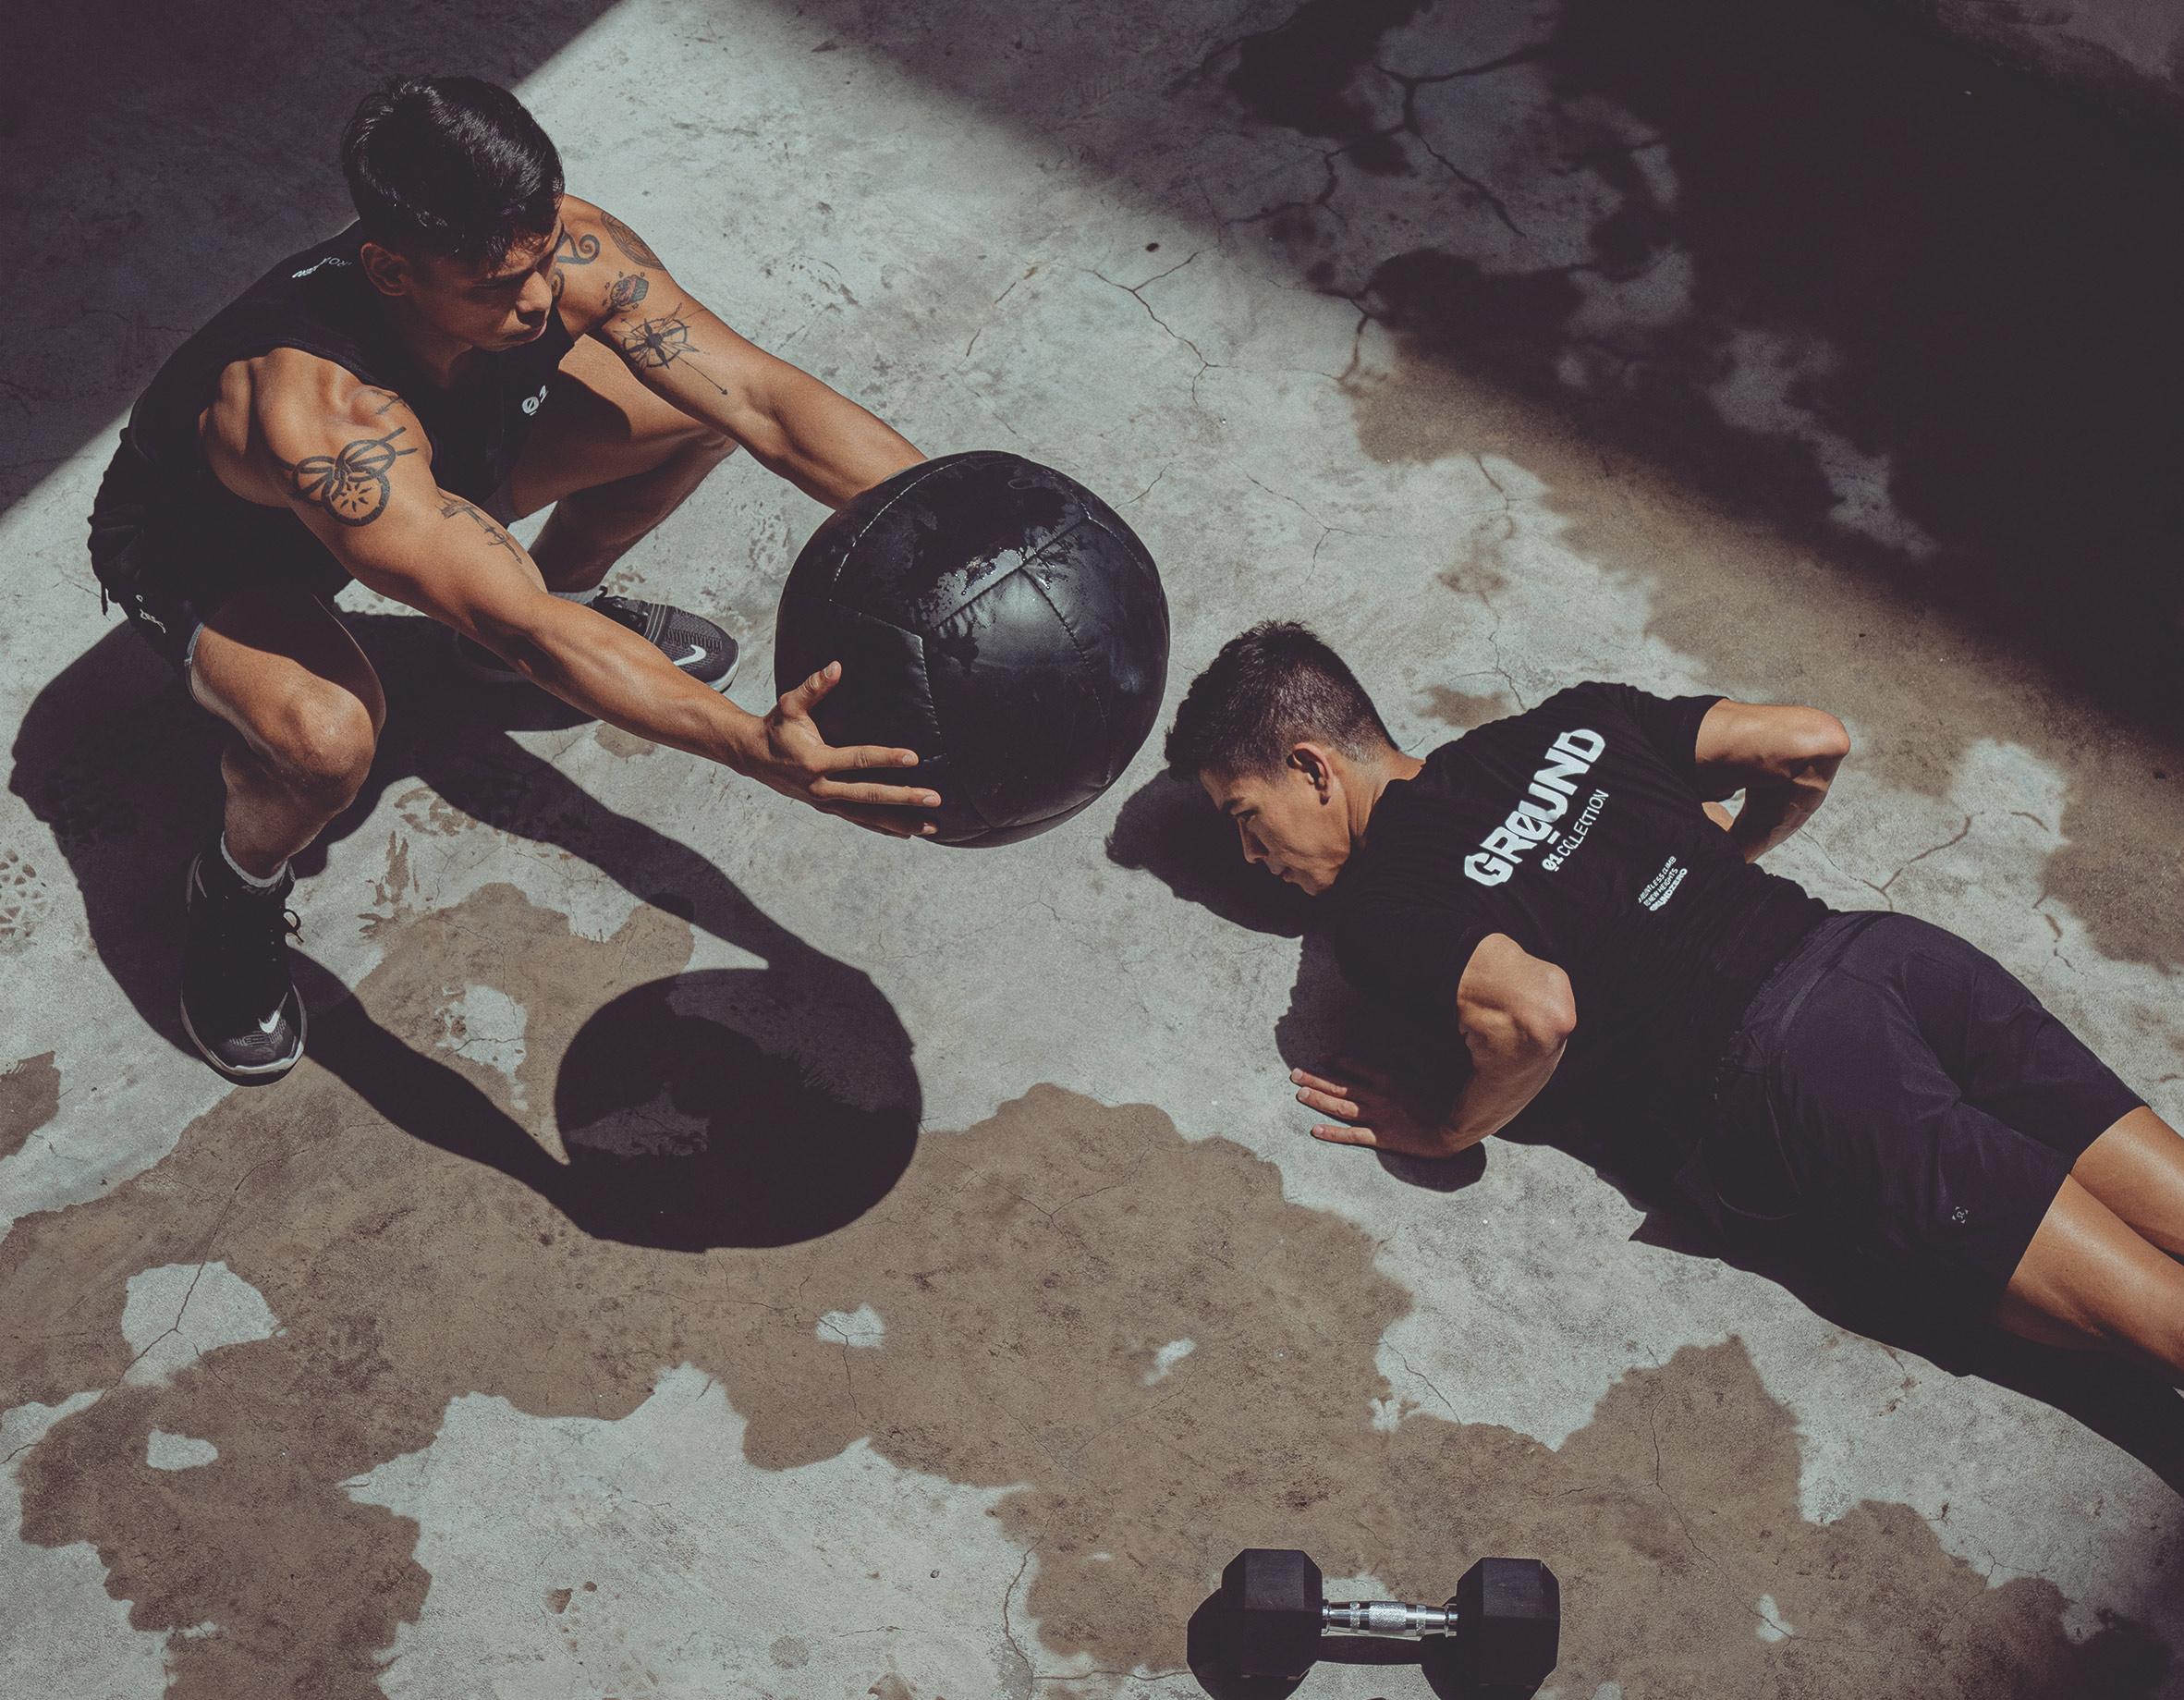 Fitness News: January/February 2020 Edition